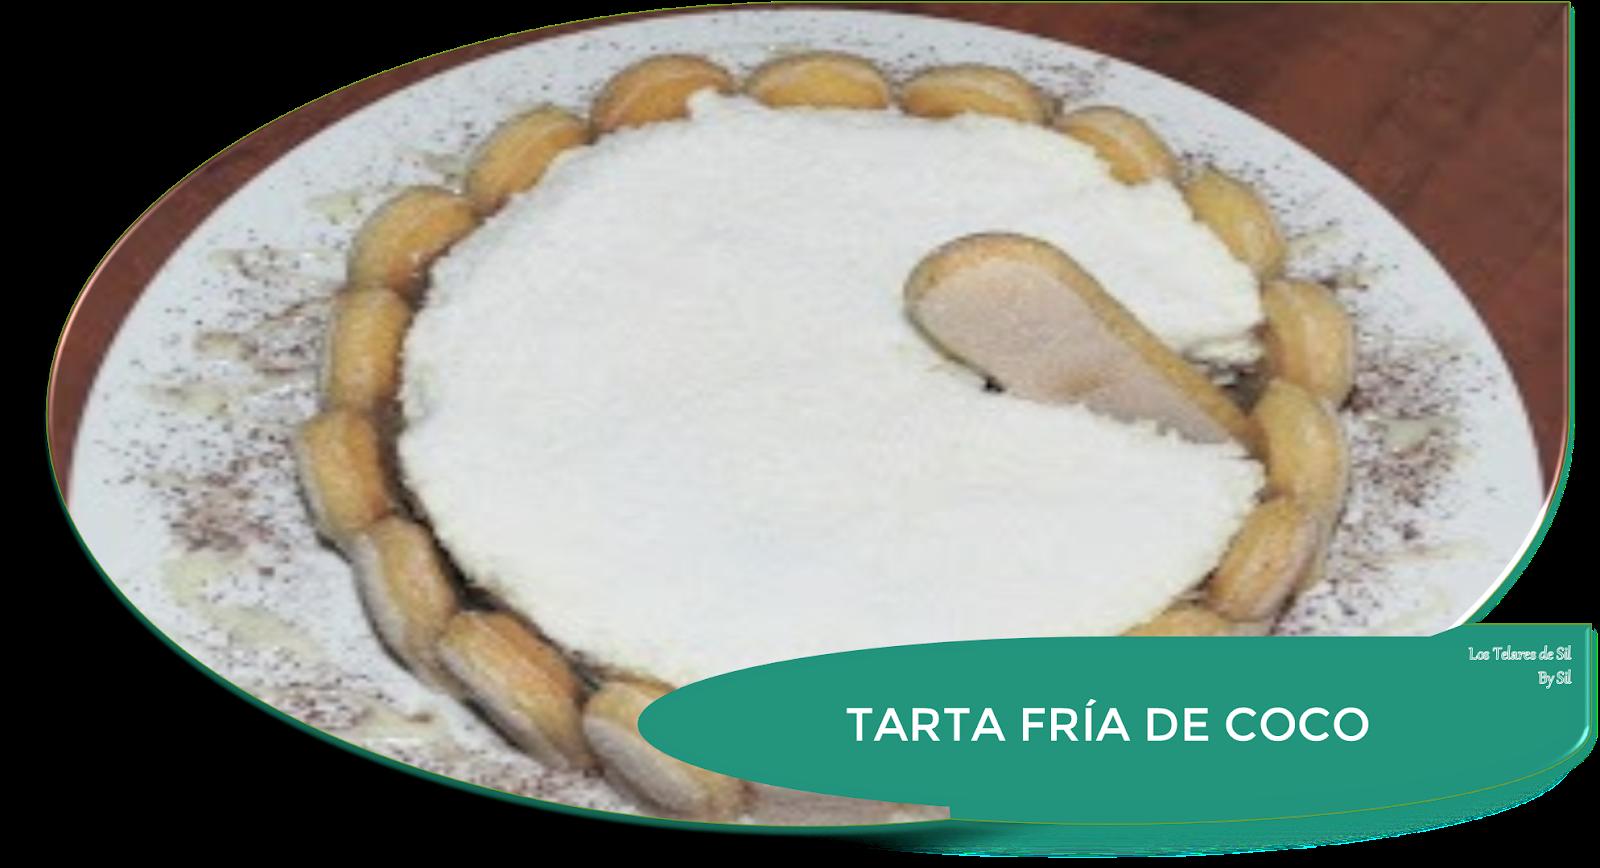 TARTA FRÍA DE COCO